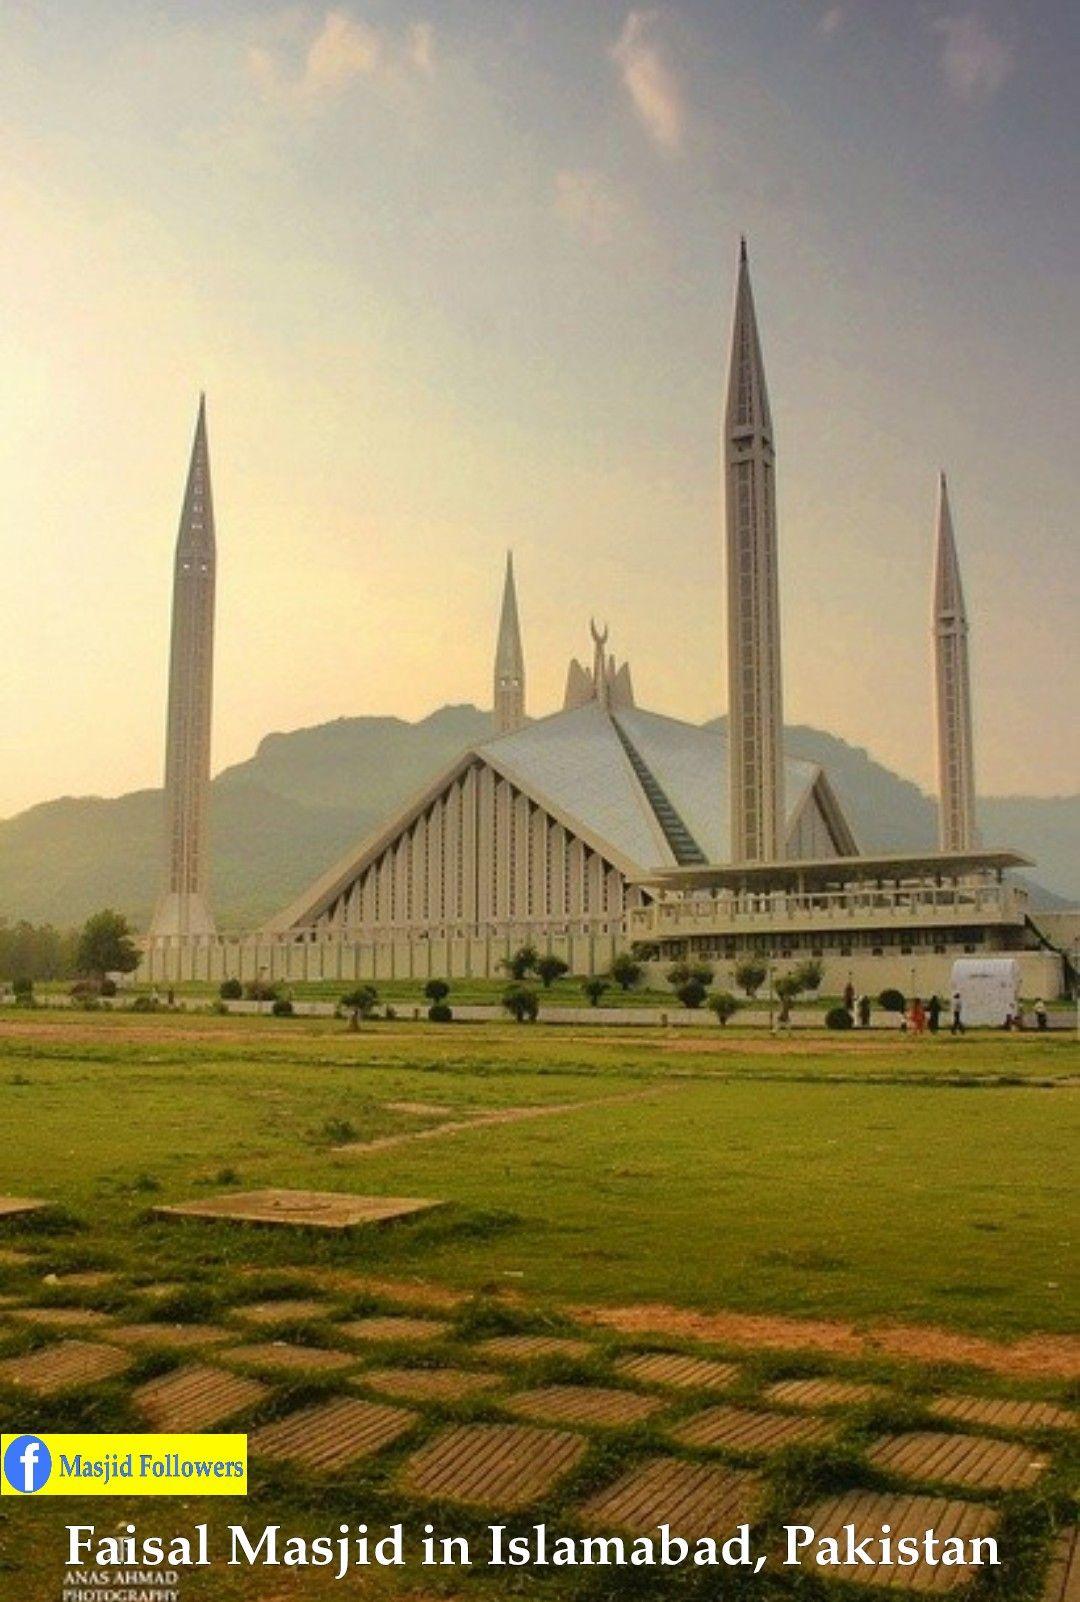 Faisal Masjid In Islamabad Pakistan Masjids From The World